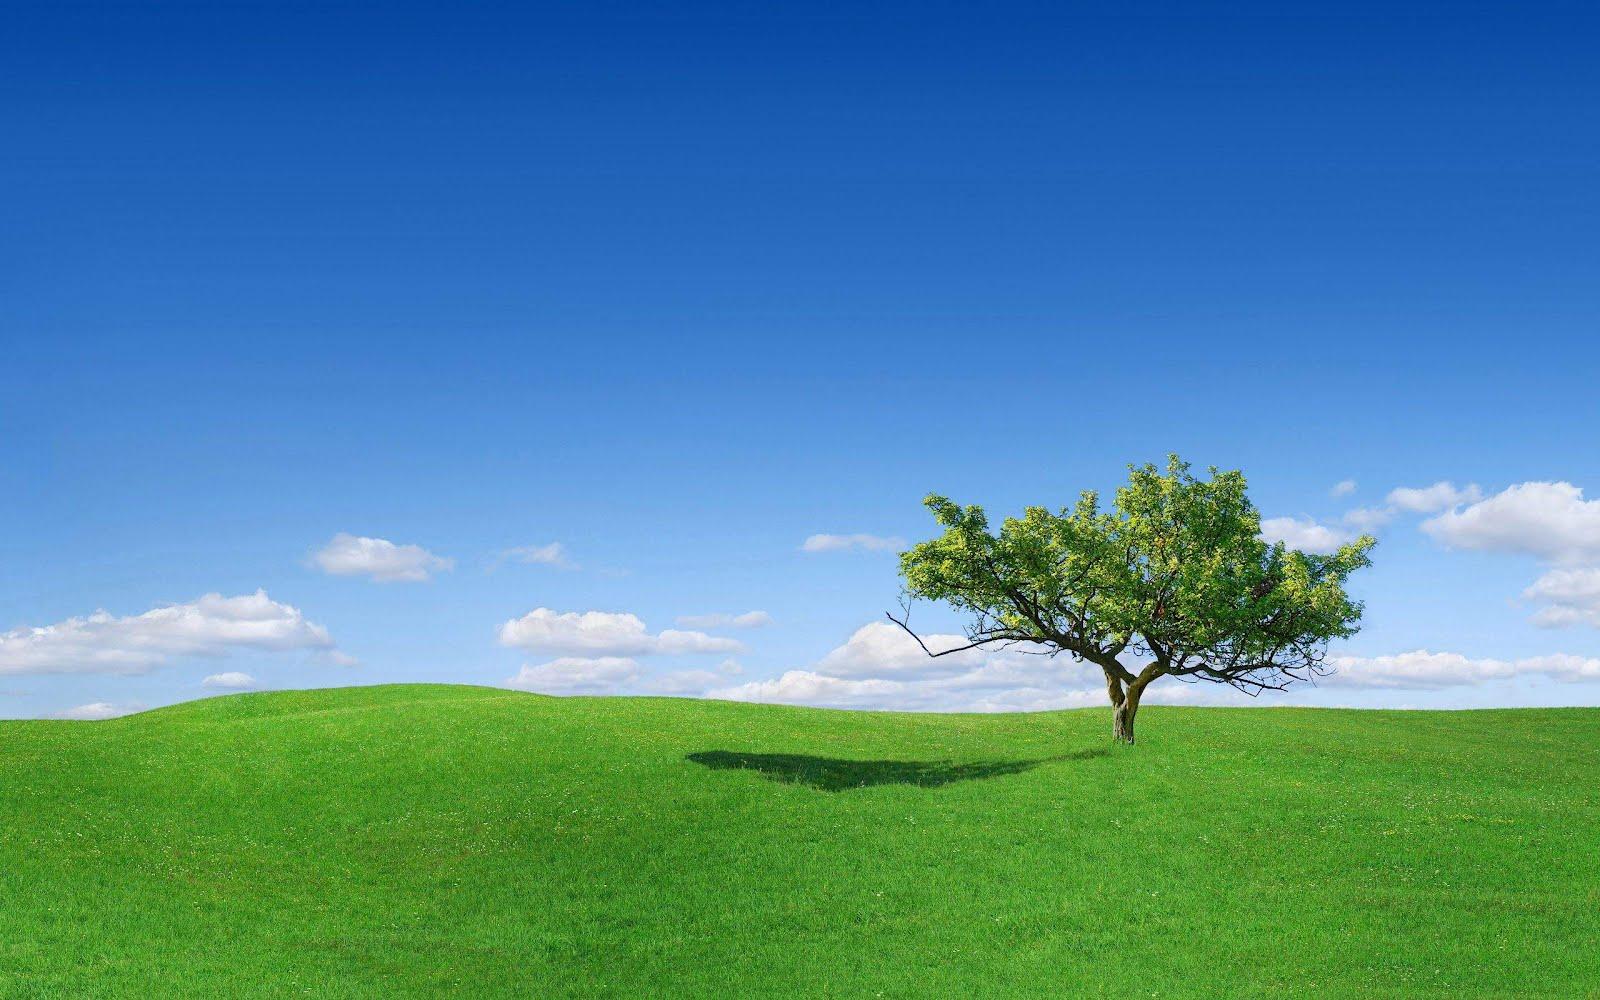 Wallpaper for desktop background grass background - Background pictures of nature for desktop ...